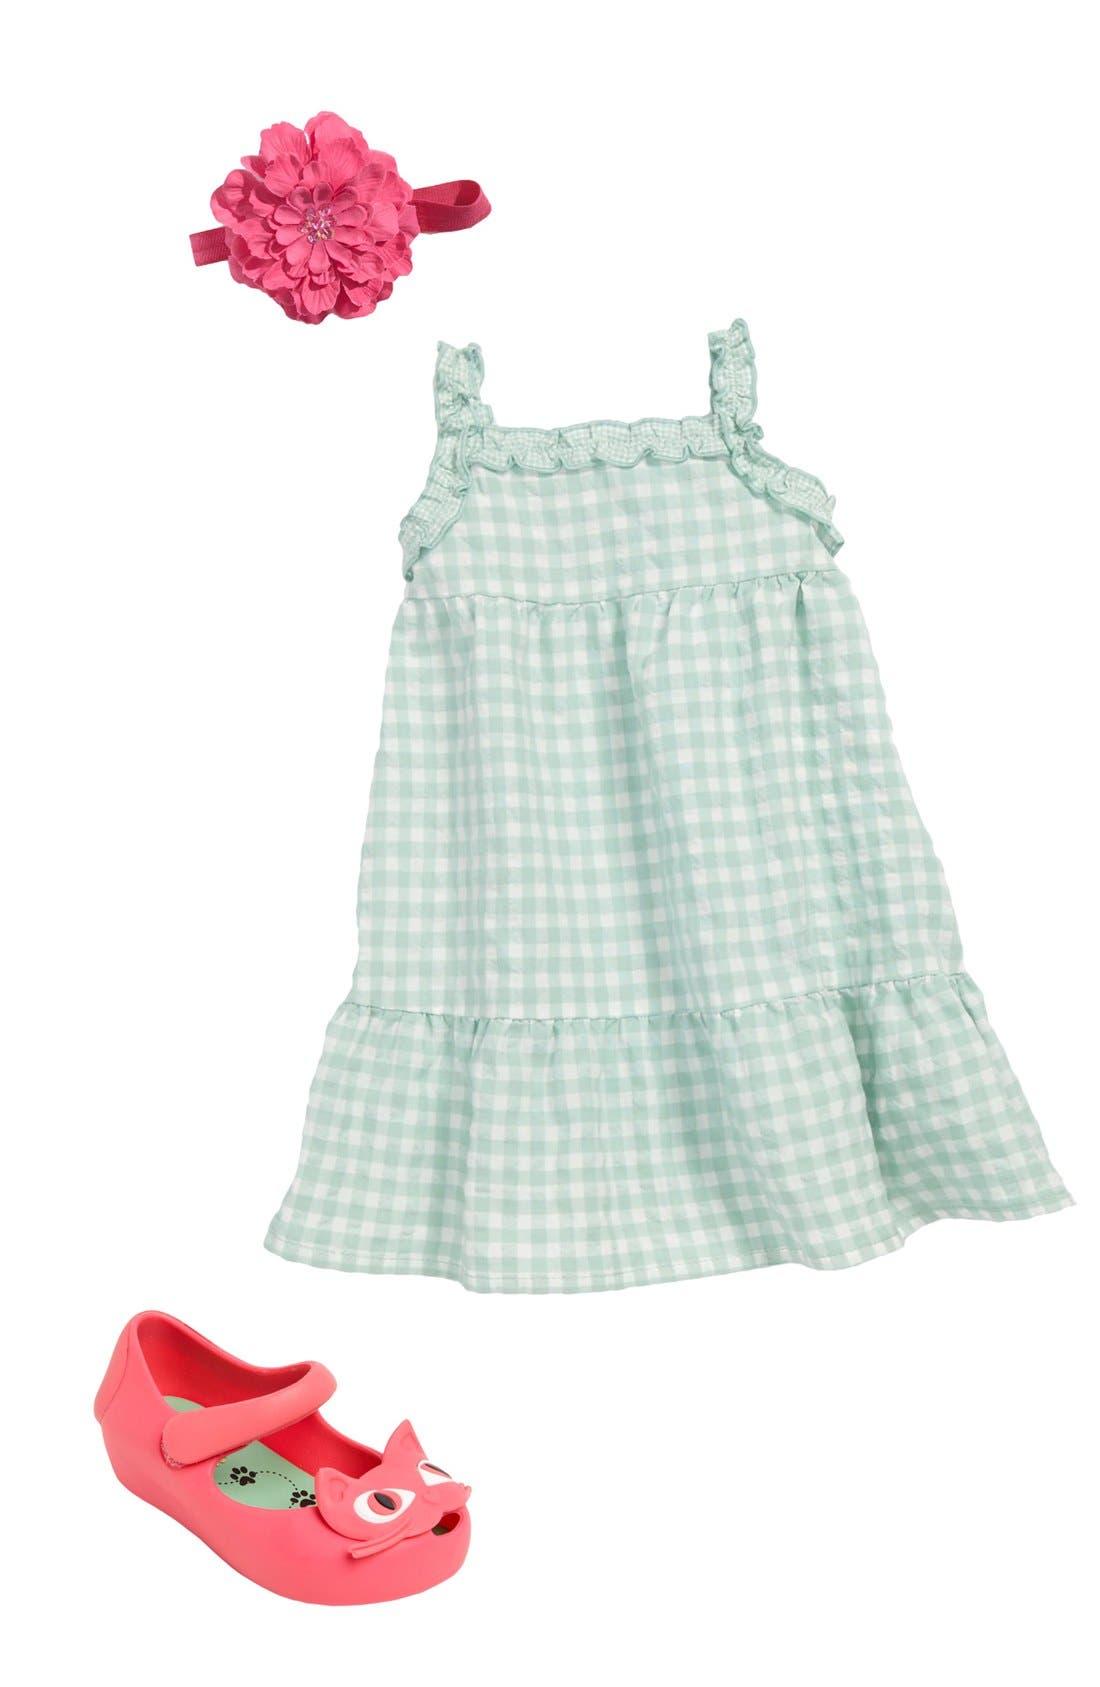 Main Image - United Colors of Benetton Kids Dress, PLH Bows & Laces Headband & Mini Melissa Slip-On (Infant)